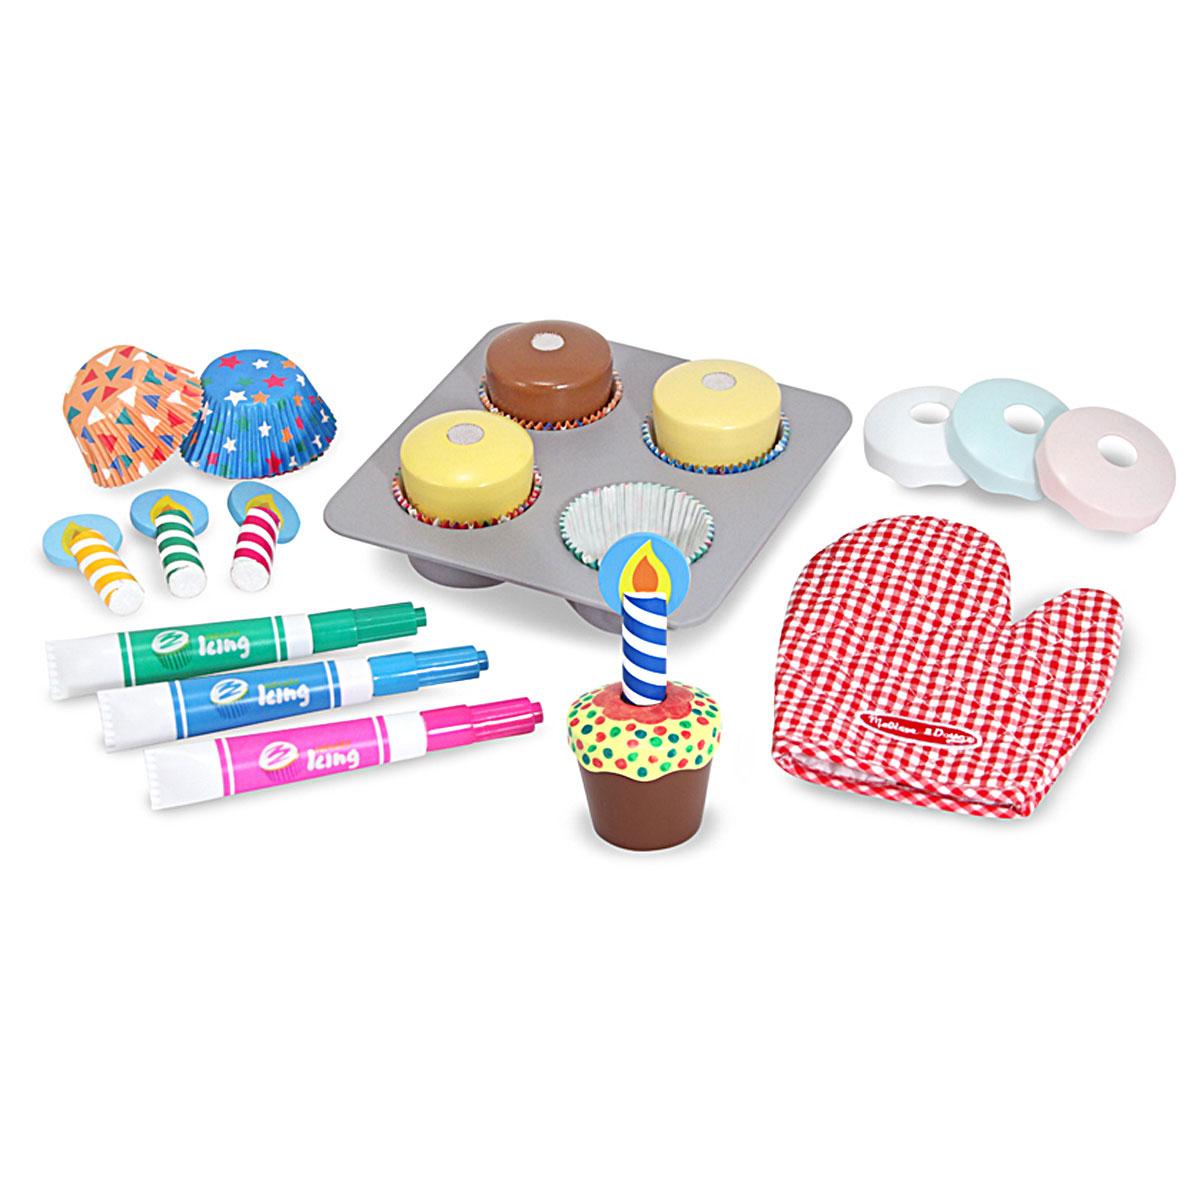 Melissa And Doug Bake And Decorate Cupcake Set